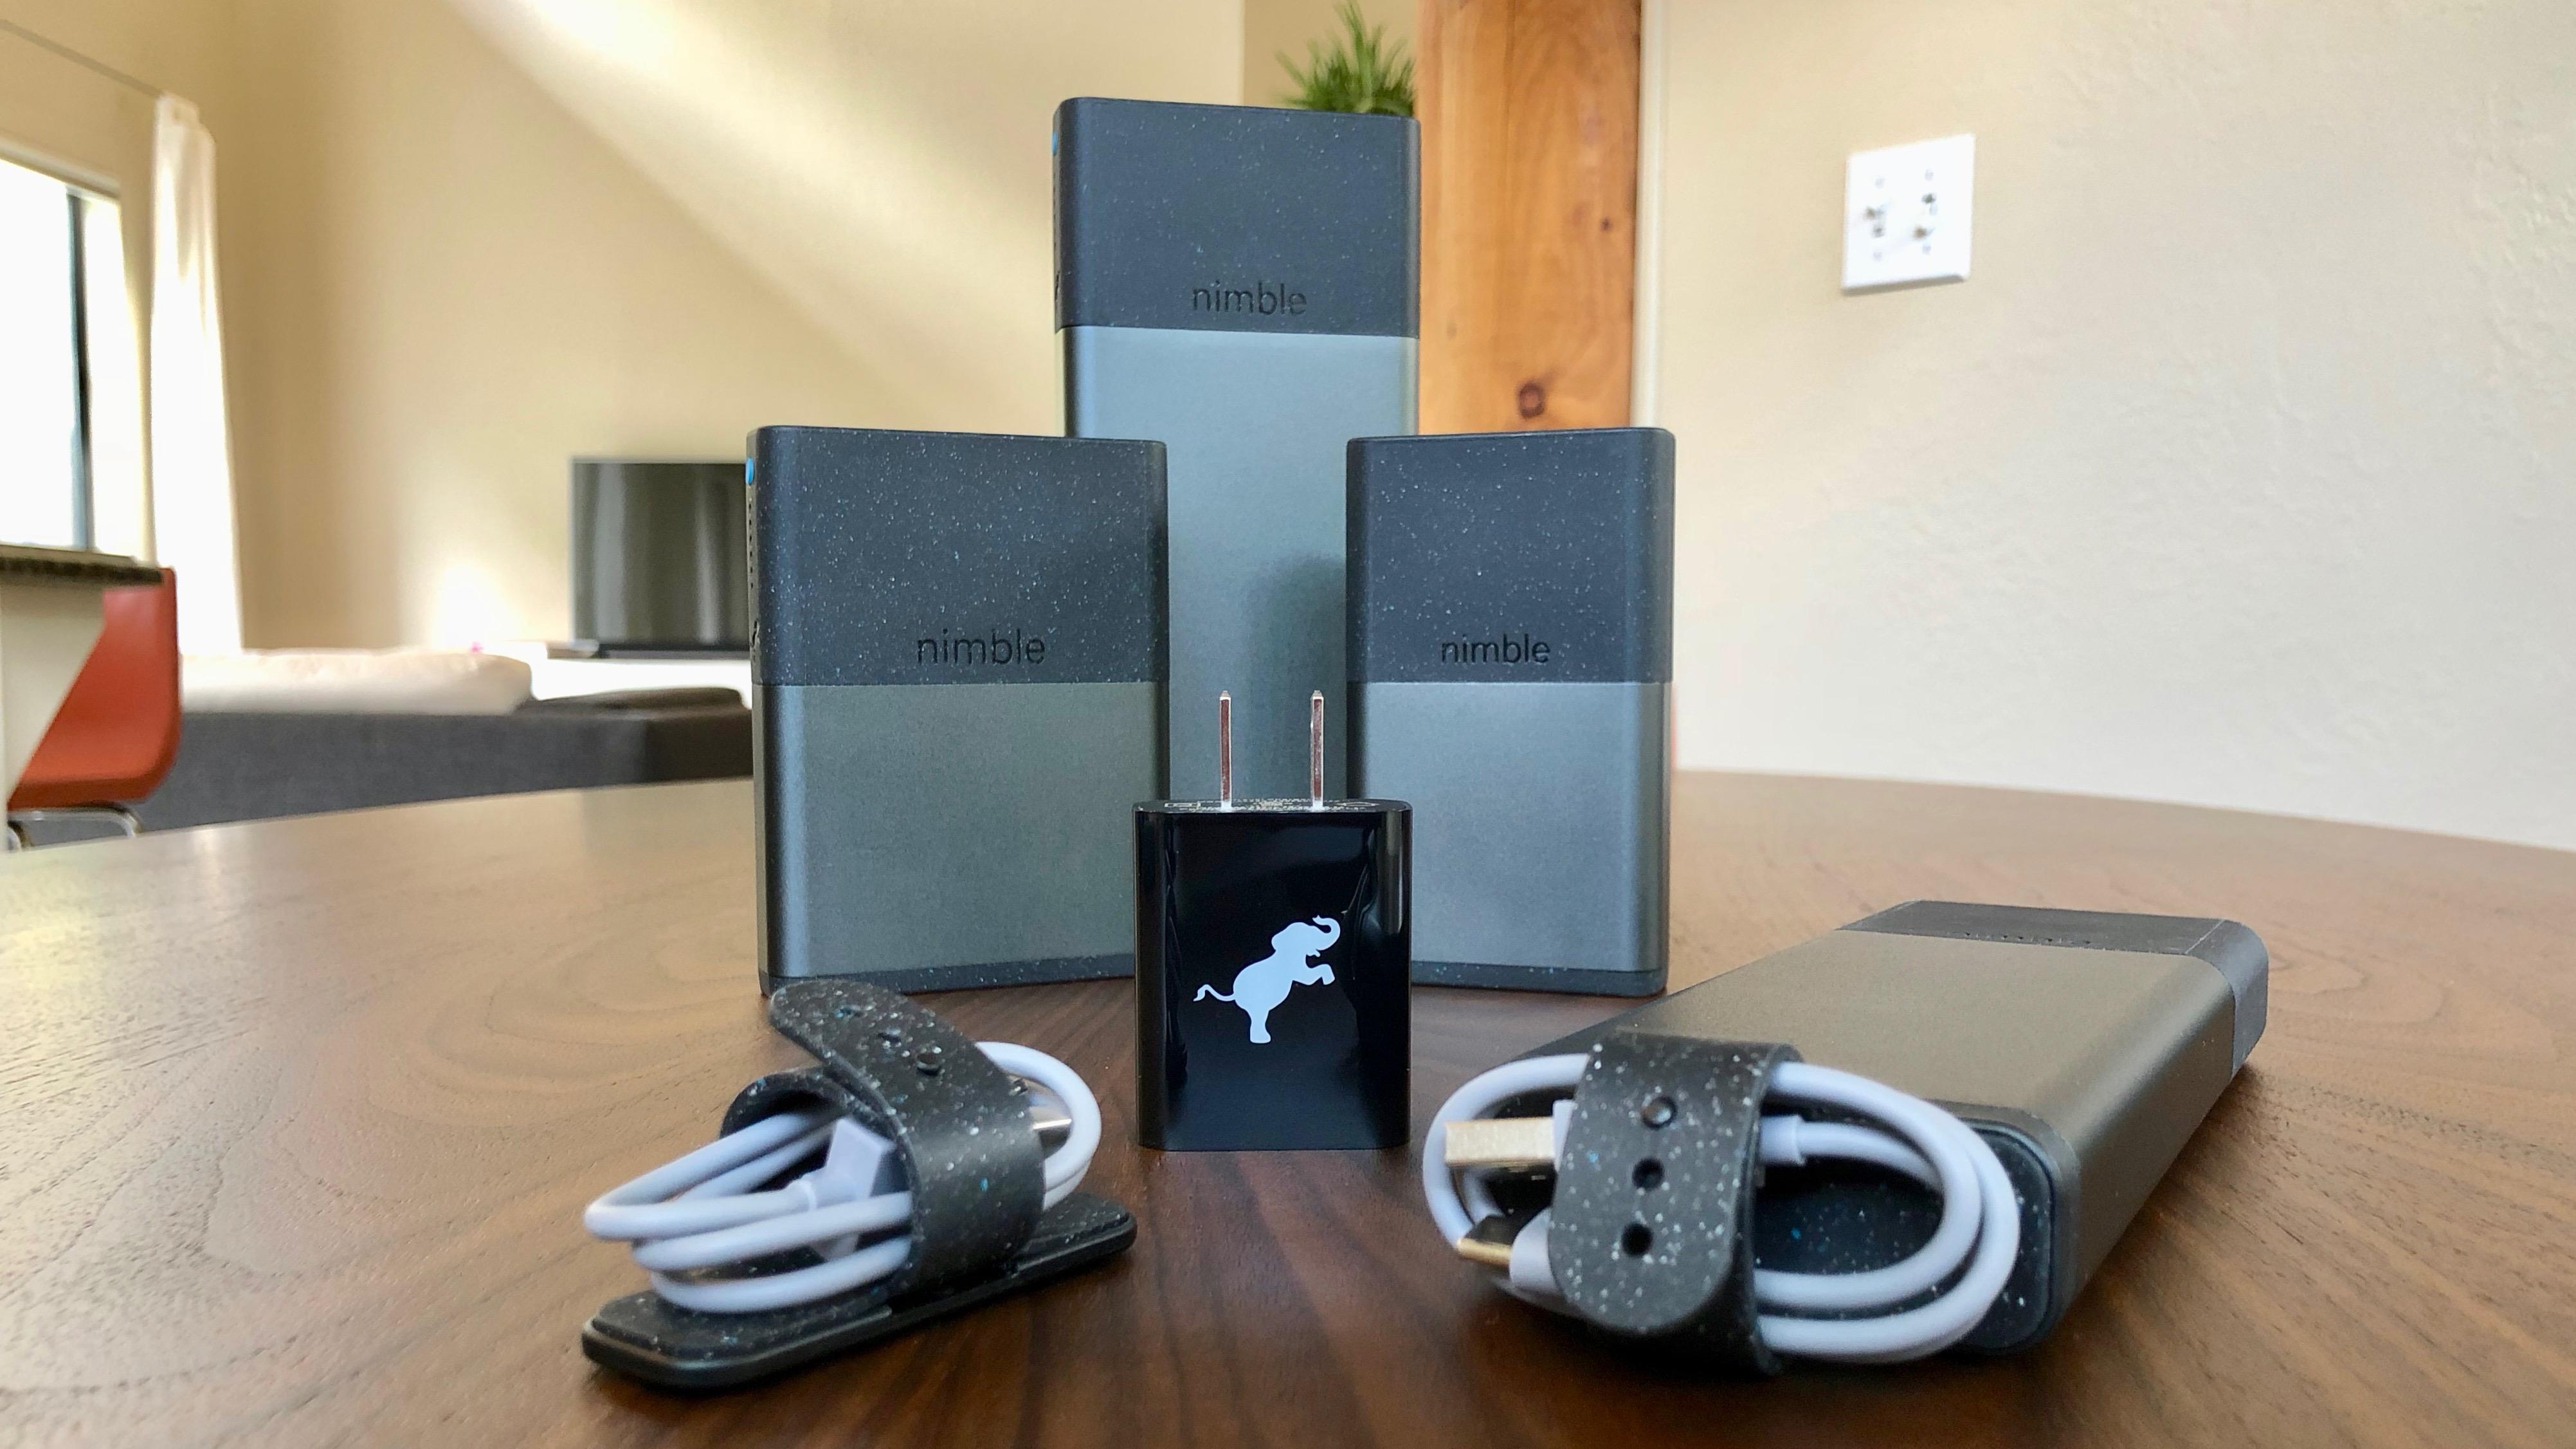 Nimble portable chargers